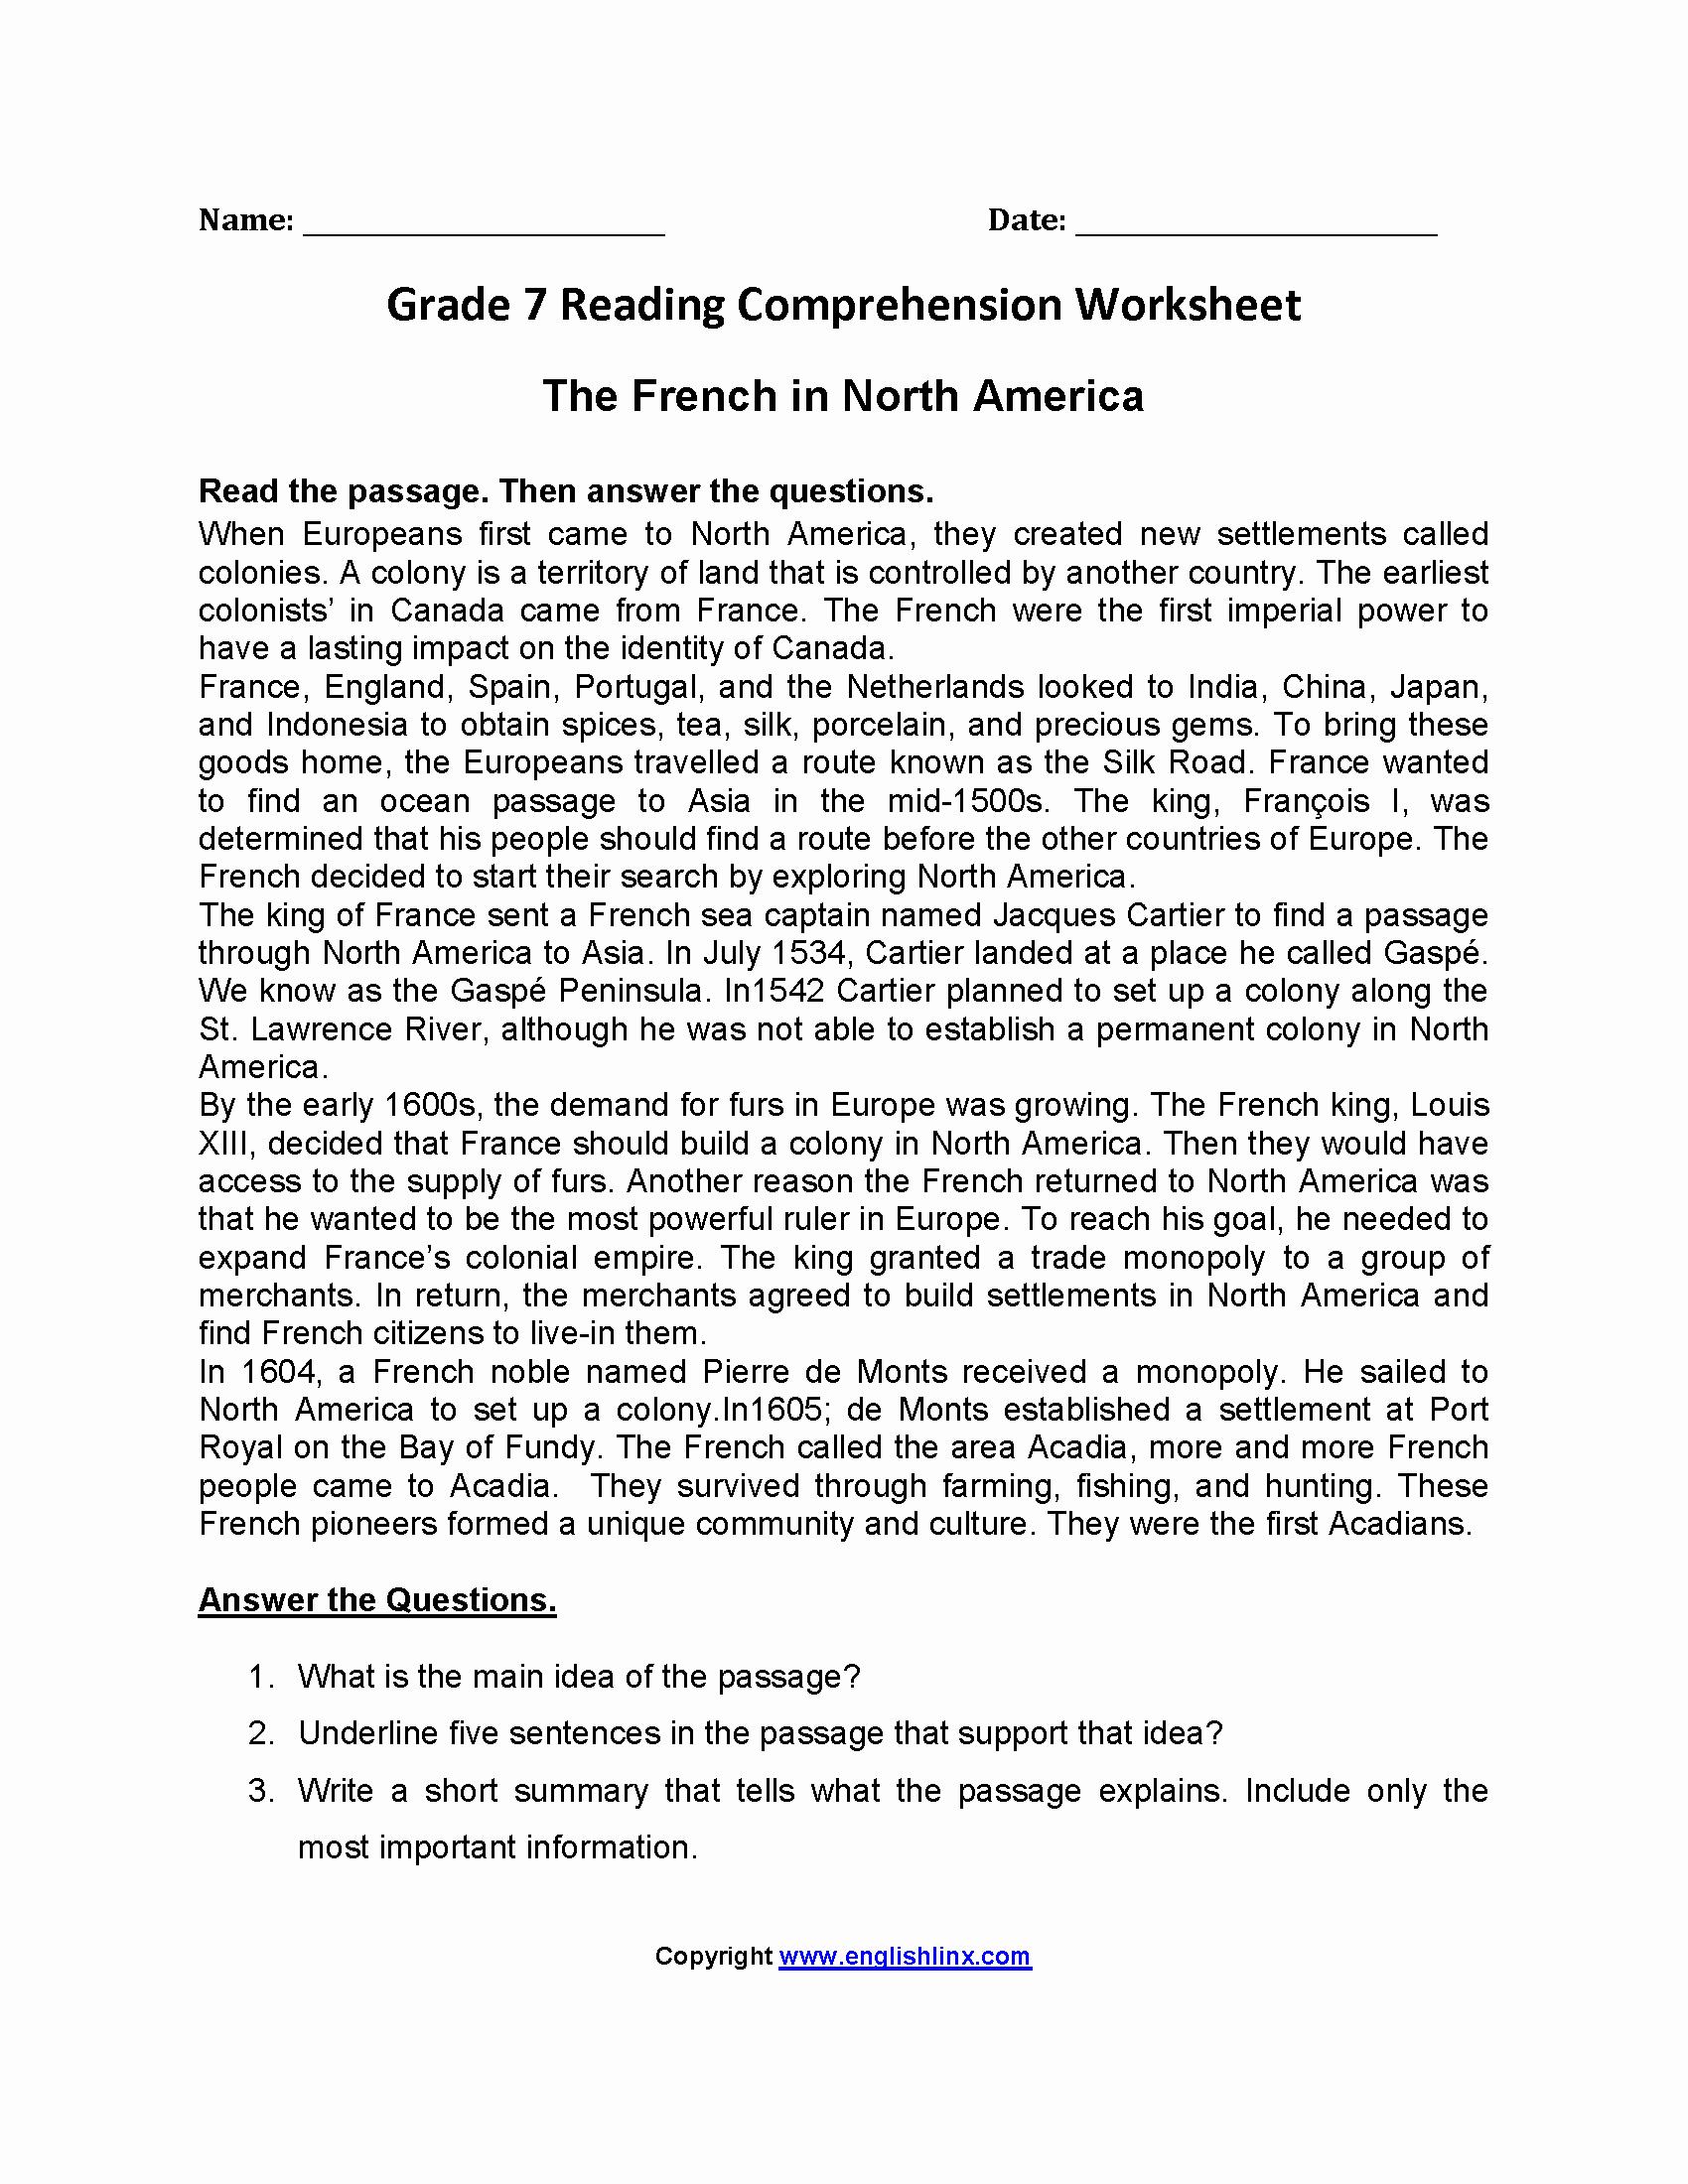 Free 7th Grade Reading Worksheets Unique Grade 7 Reading Prehension Worksheets Pdf